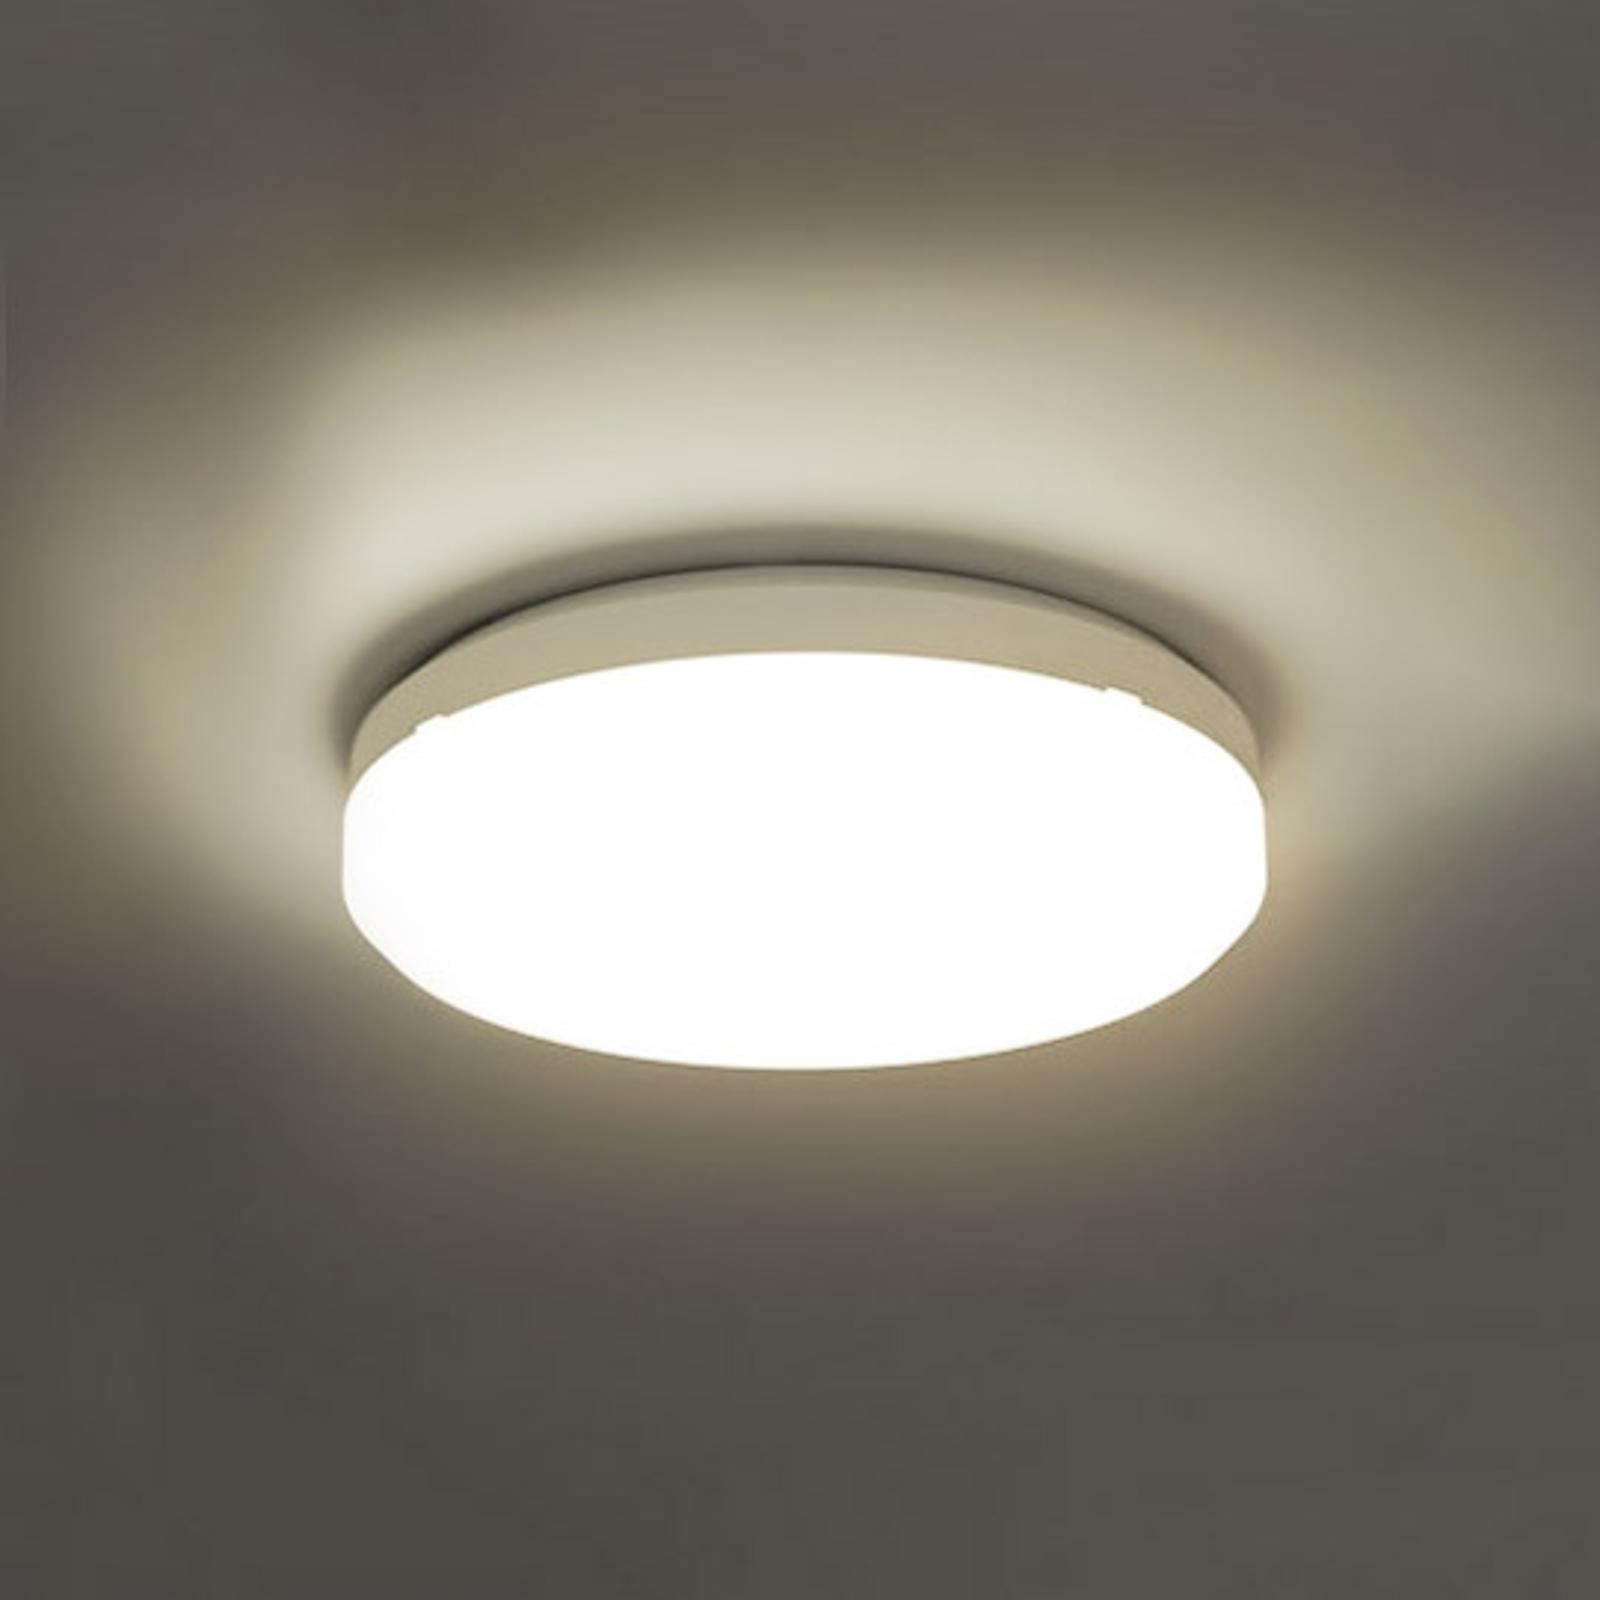 Sun 15 lampa sufitowa LED IP65 18 W 3000K